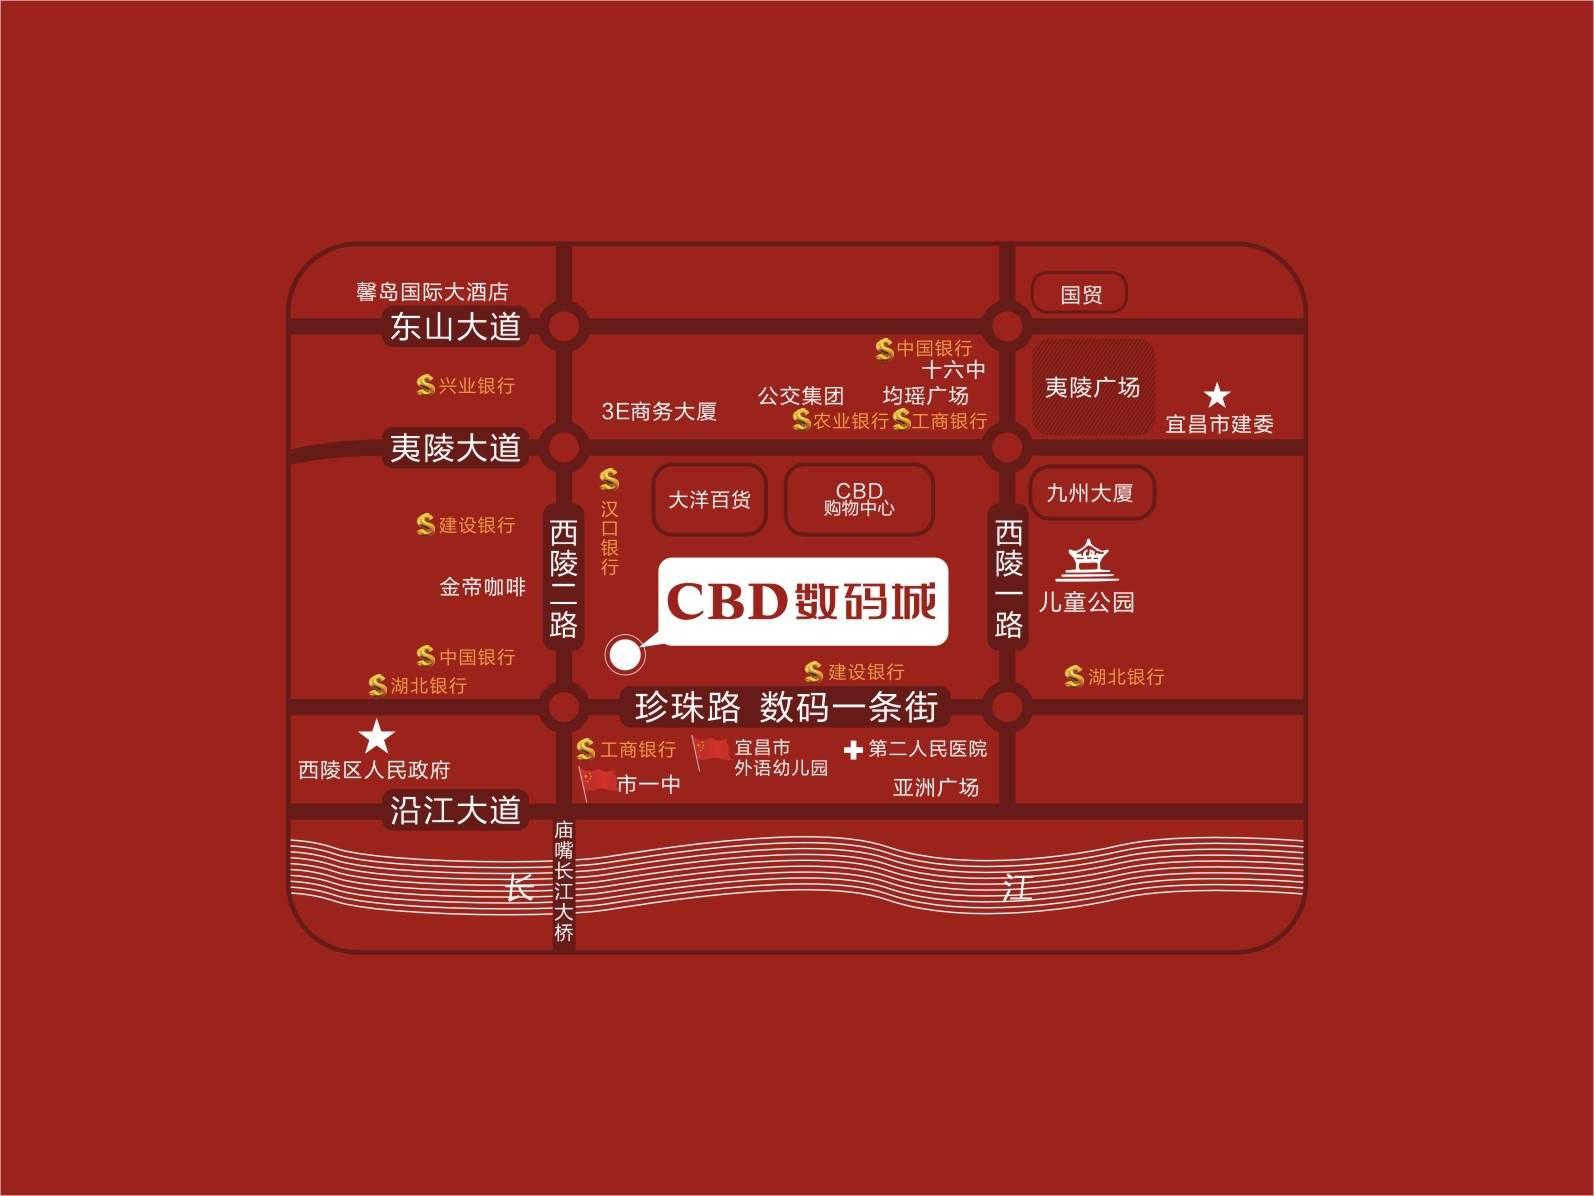 CBD数码城位置图